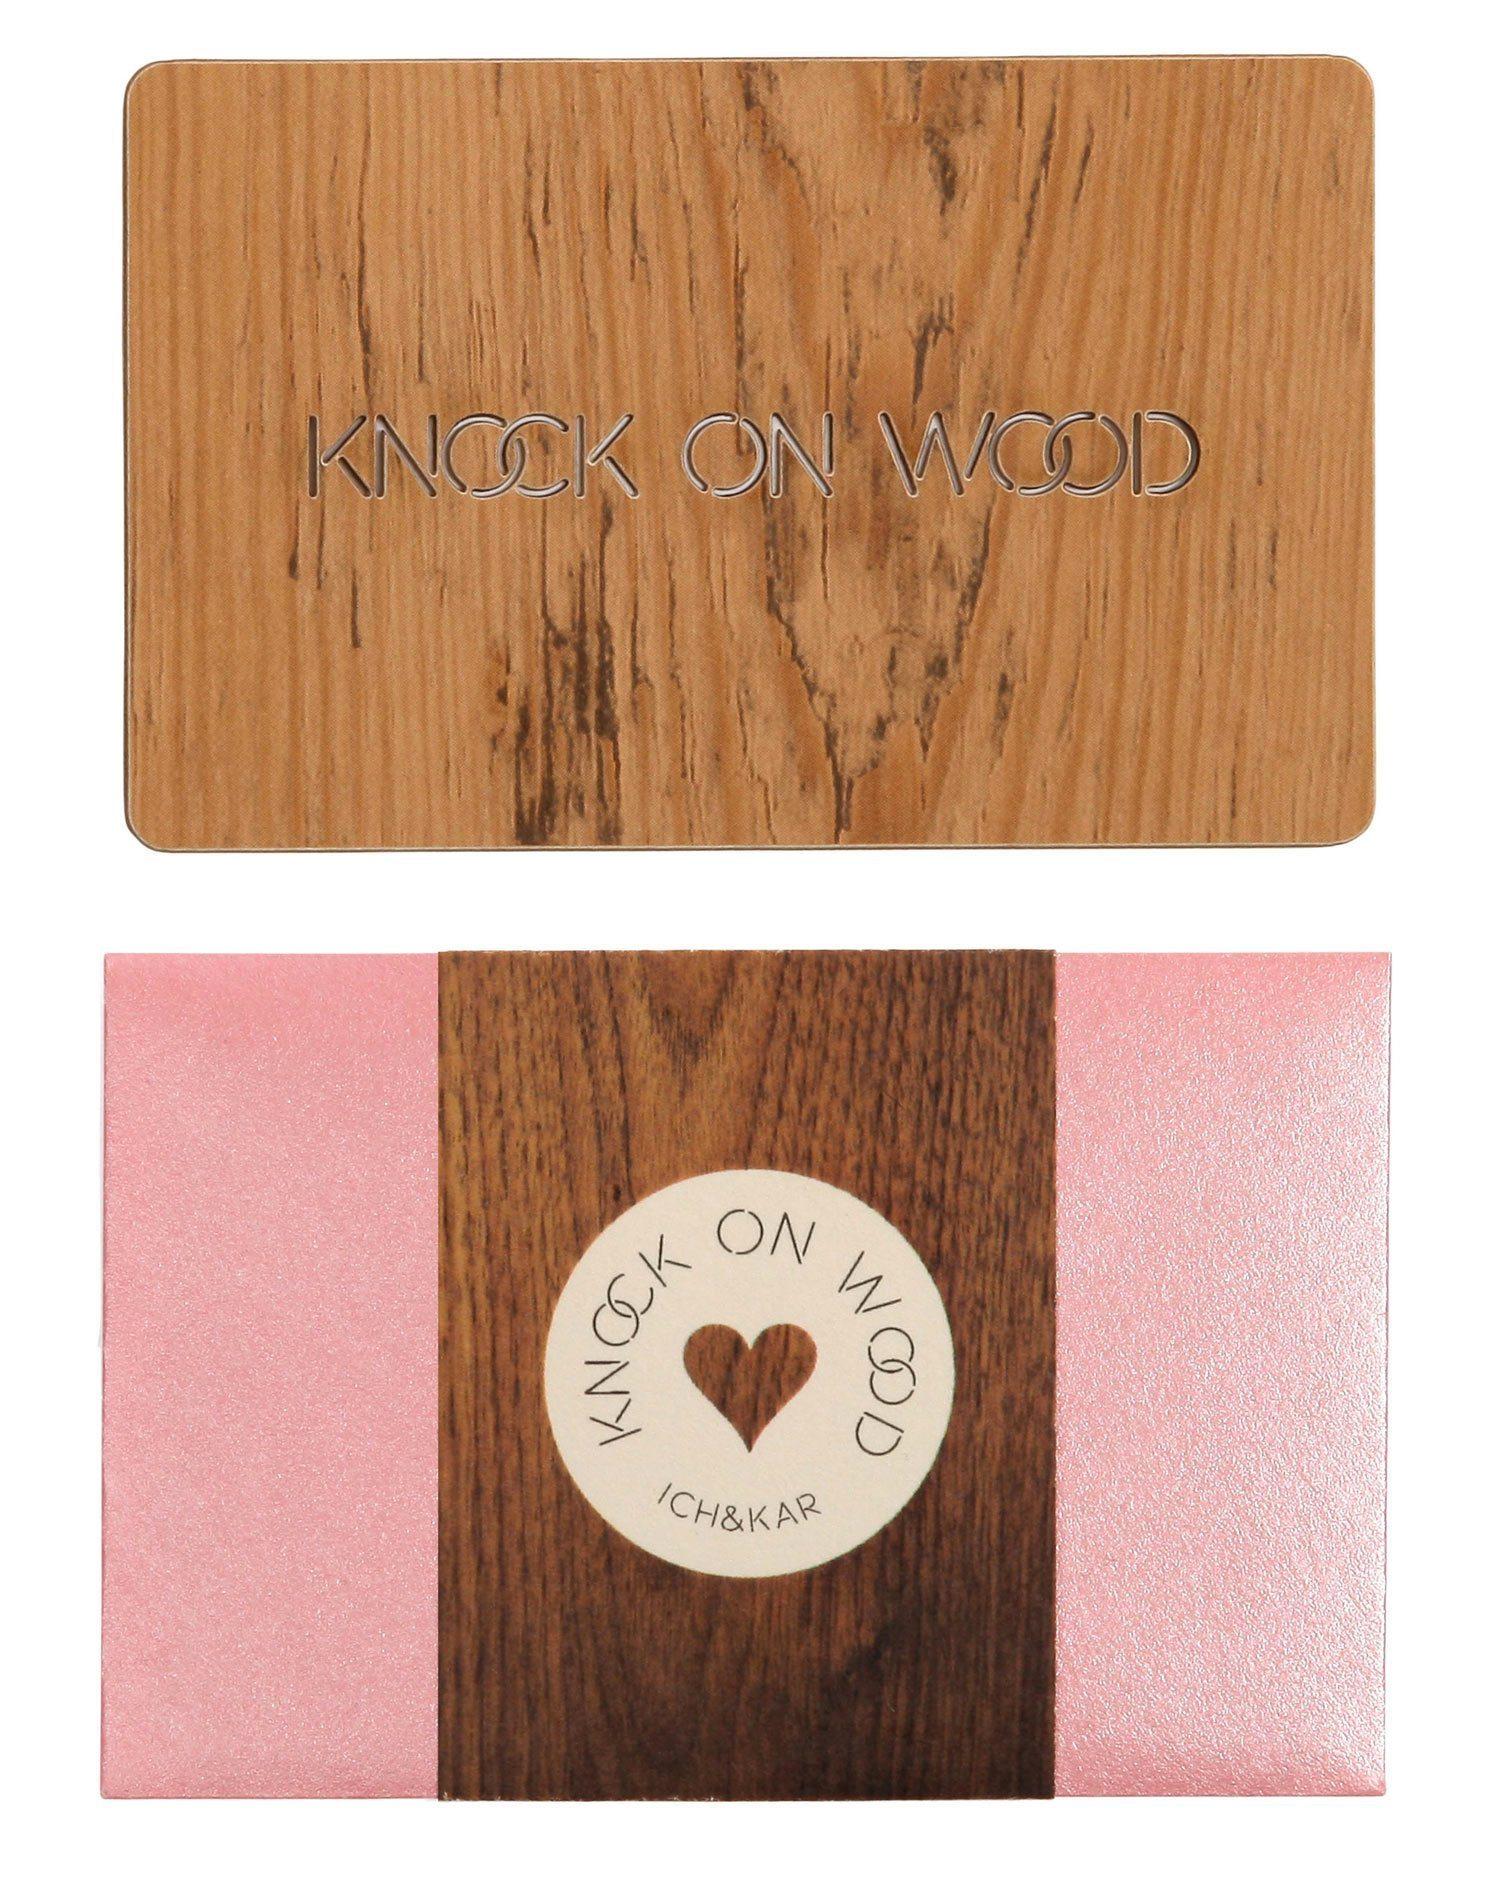 knook-on-wood-love_IchetKar